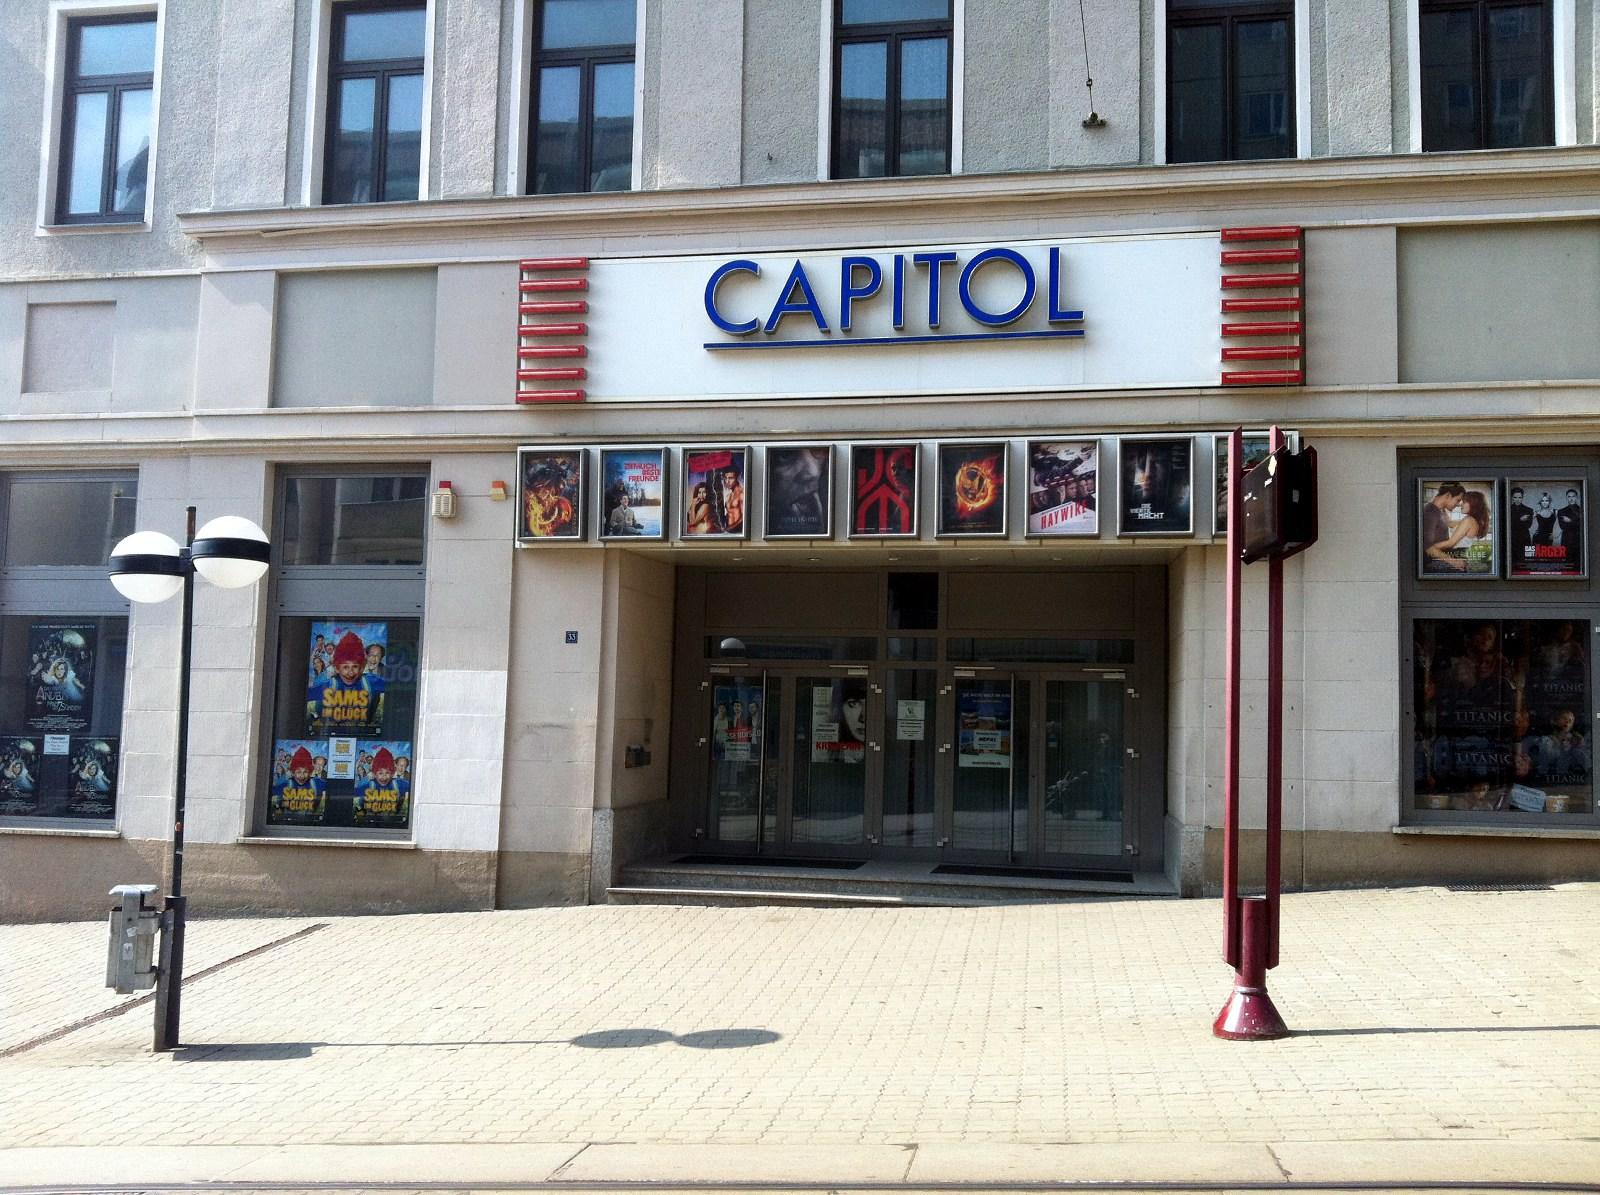 Cinestar Capitol